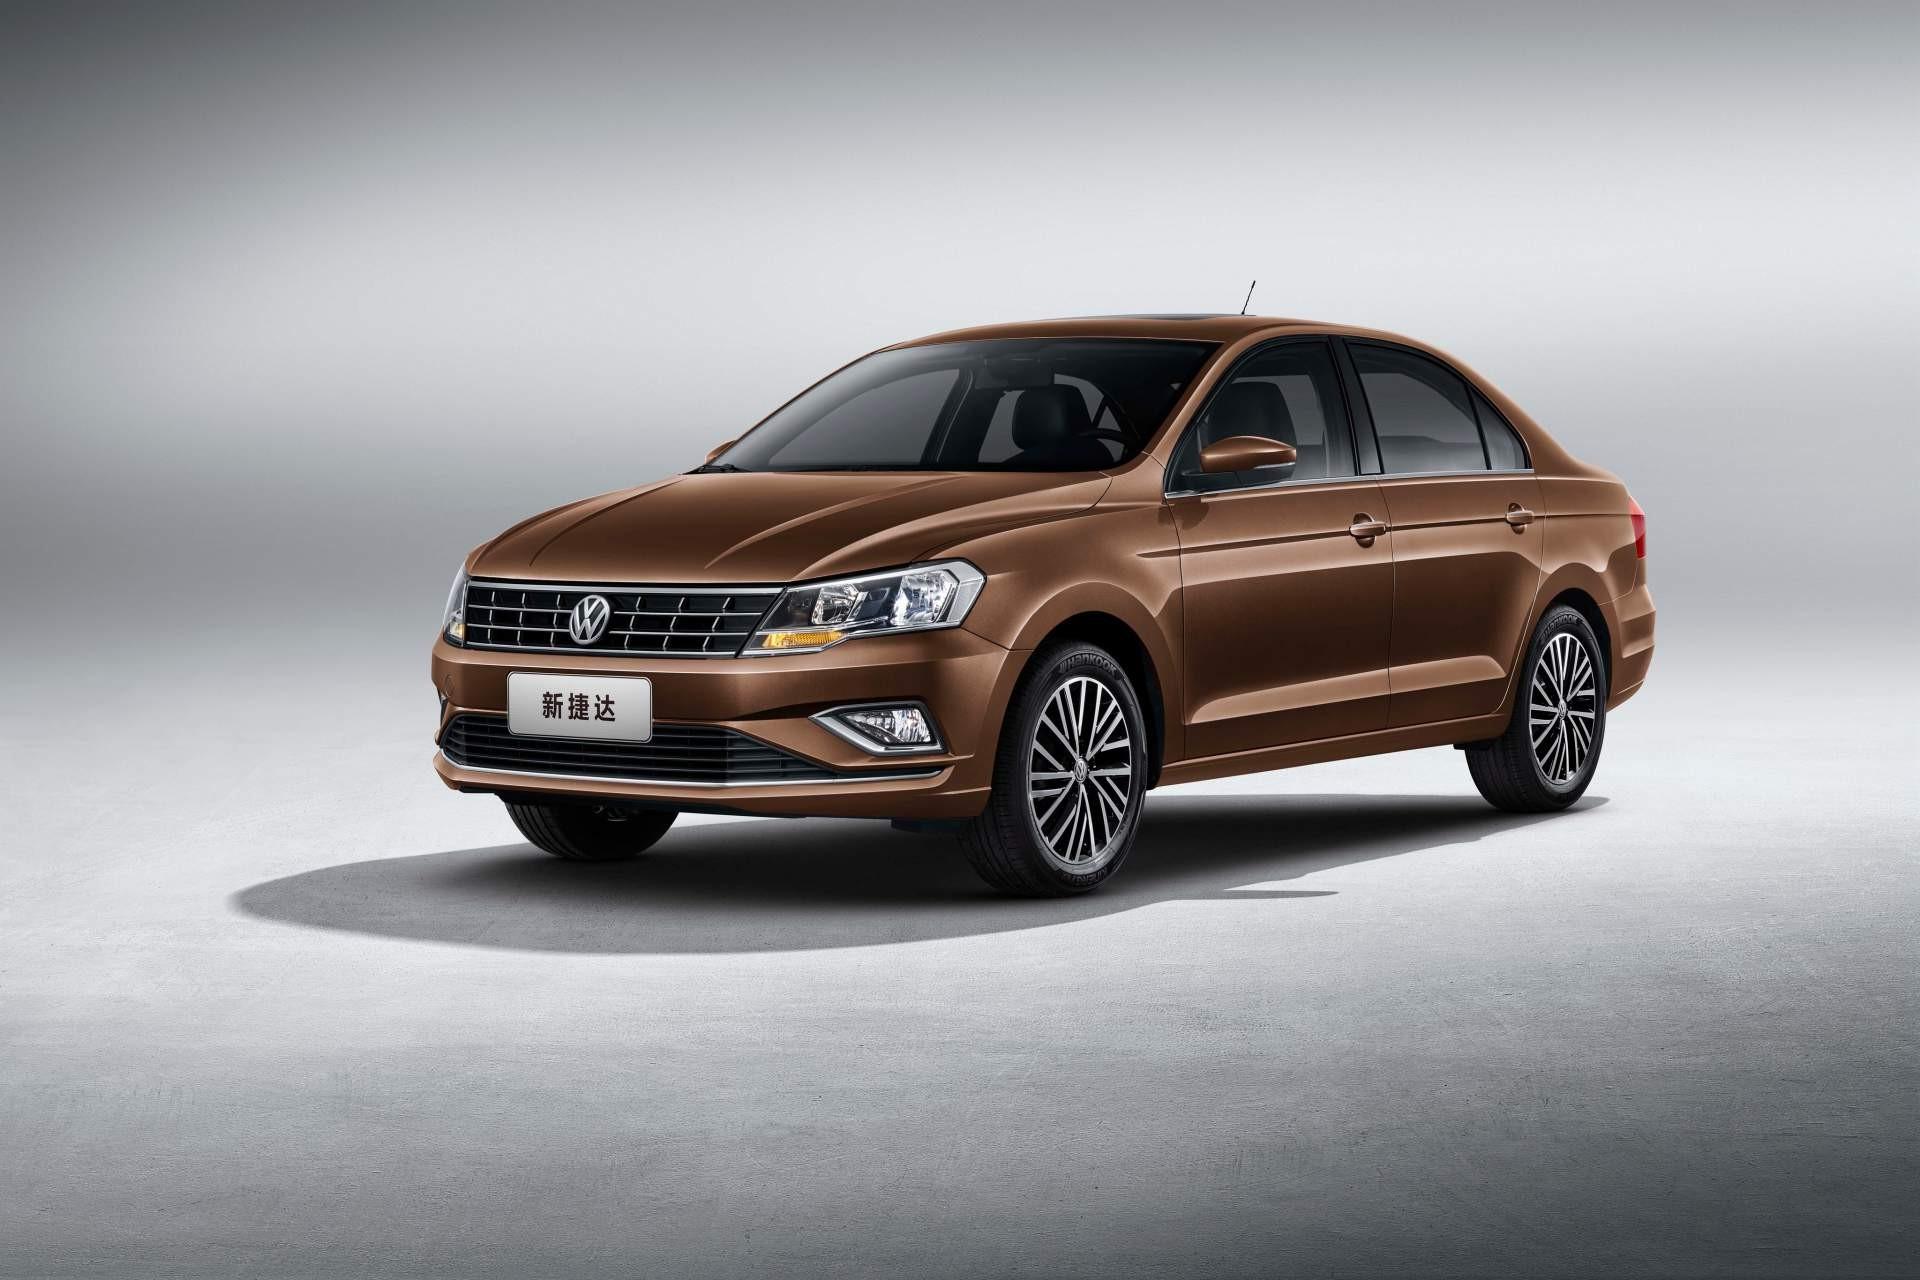 Jetta станет бюджетным брендом VW в Китае 2